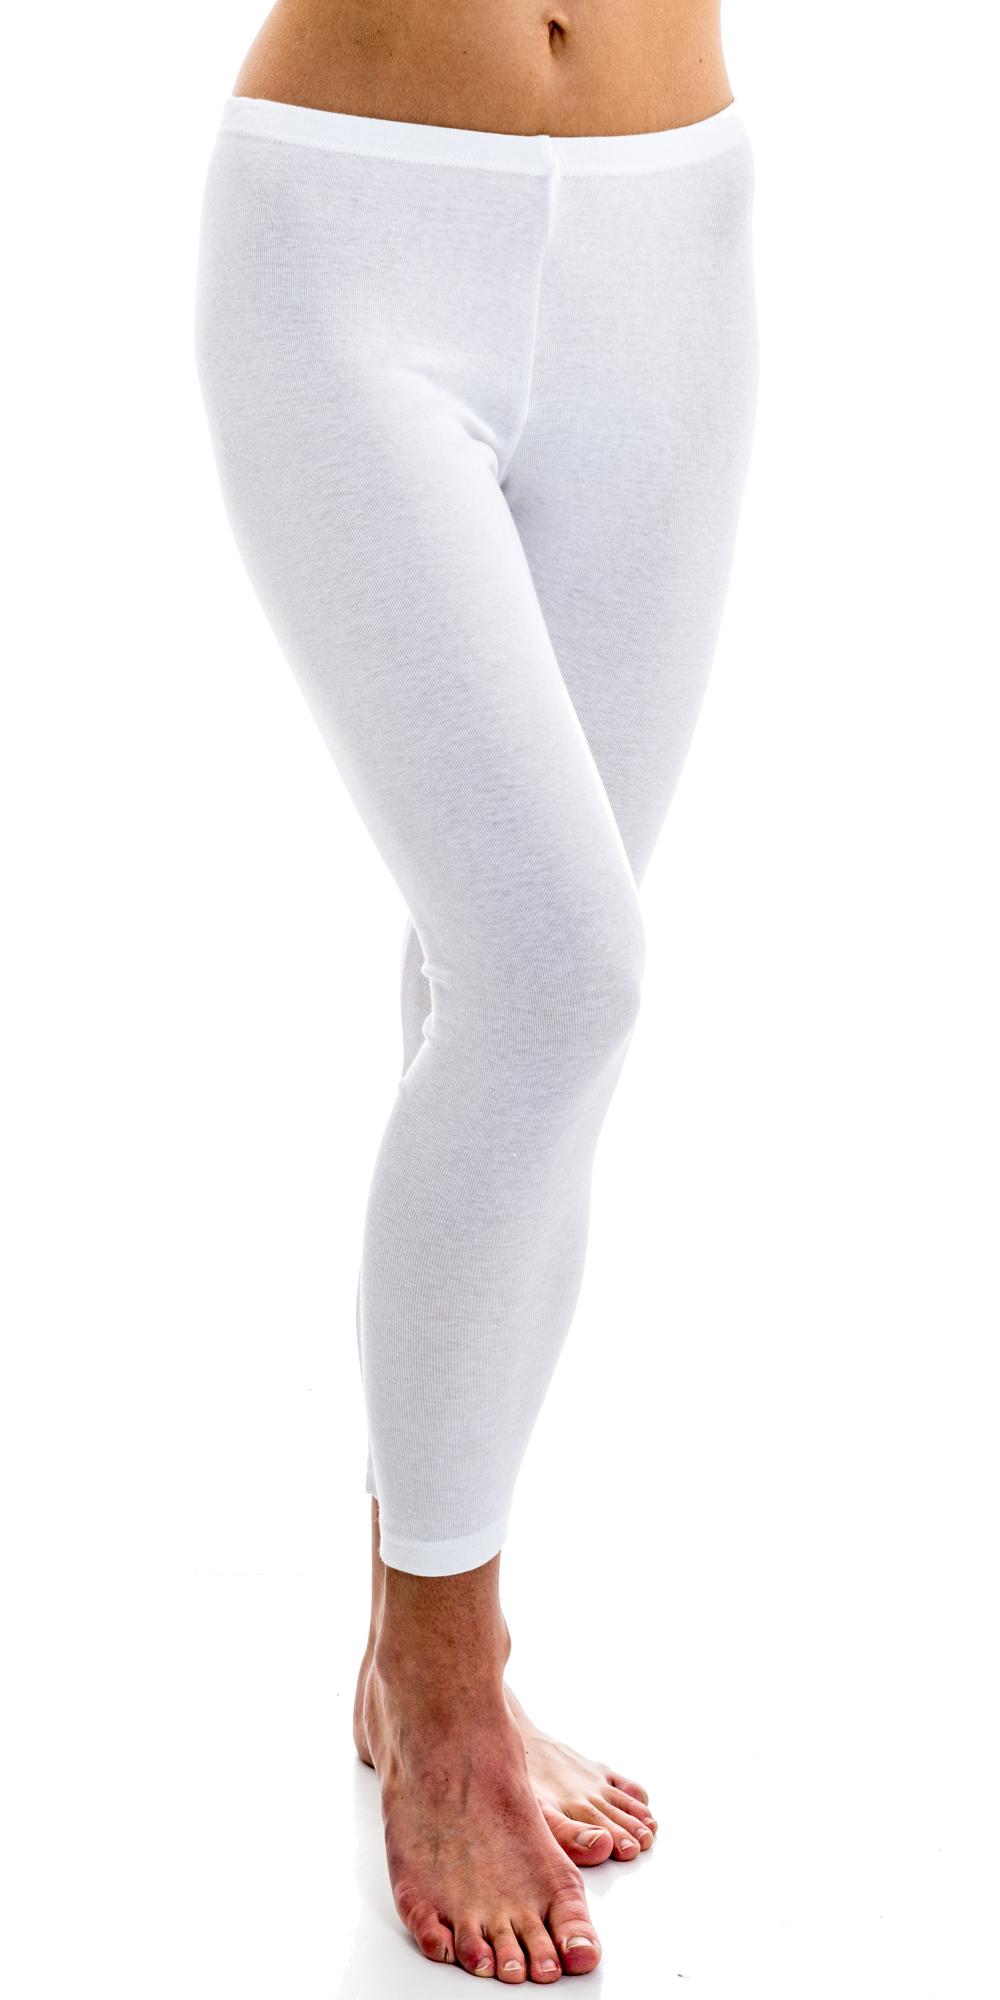 9de4740de91c31 HERMKO 5720 Damen Leggings aus Baumwolle / Elastan